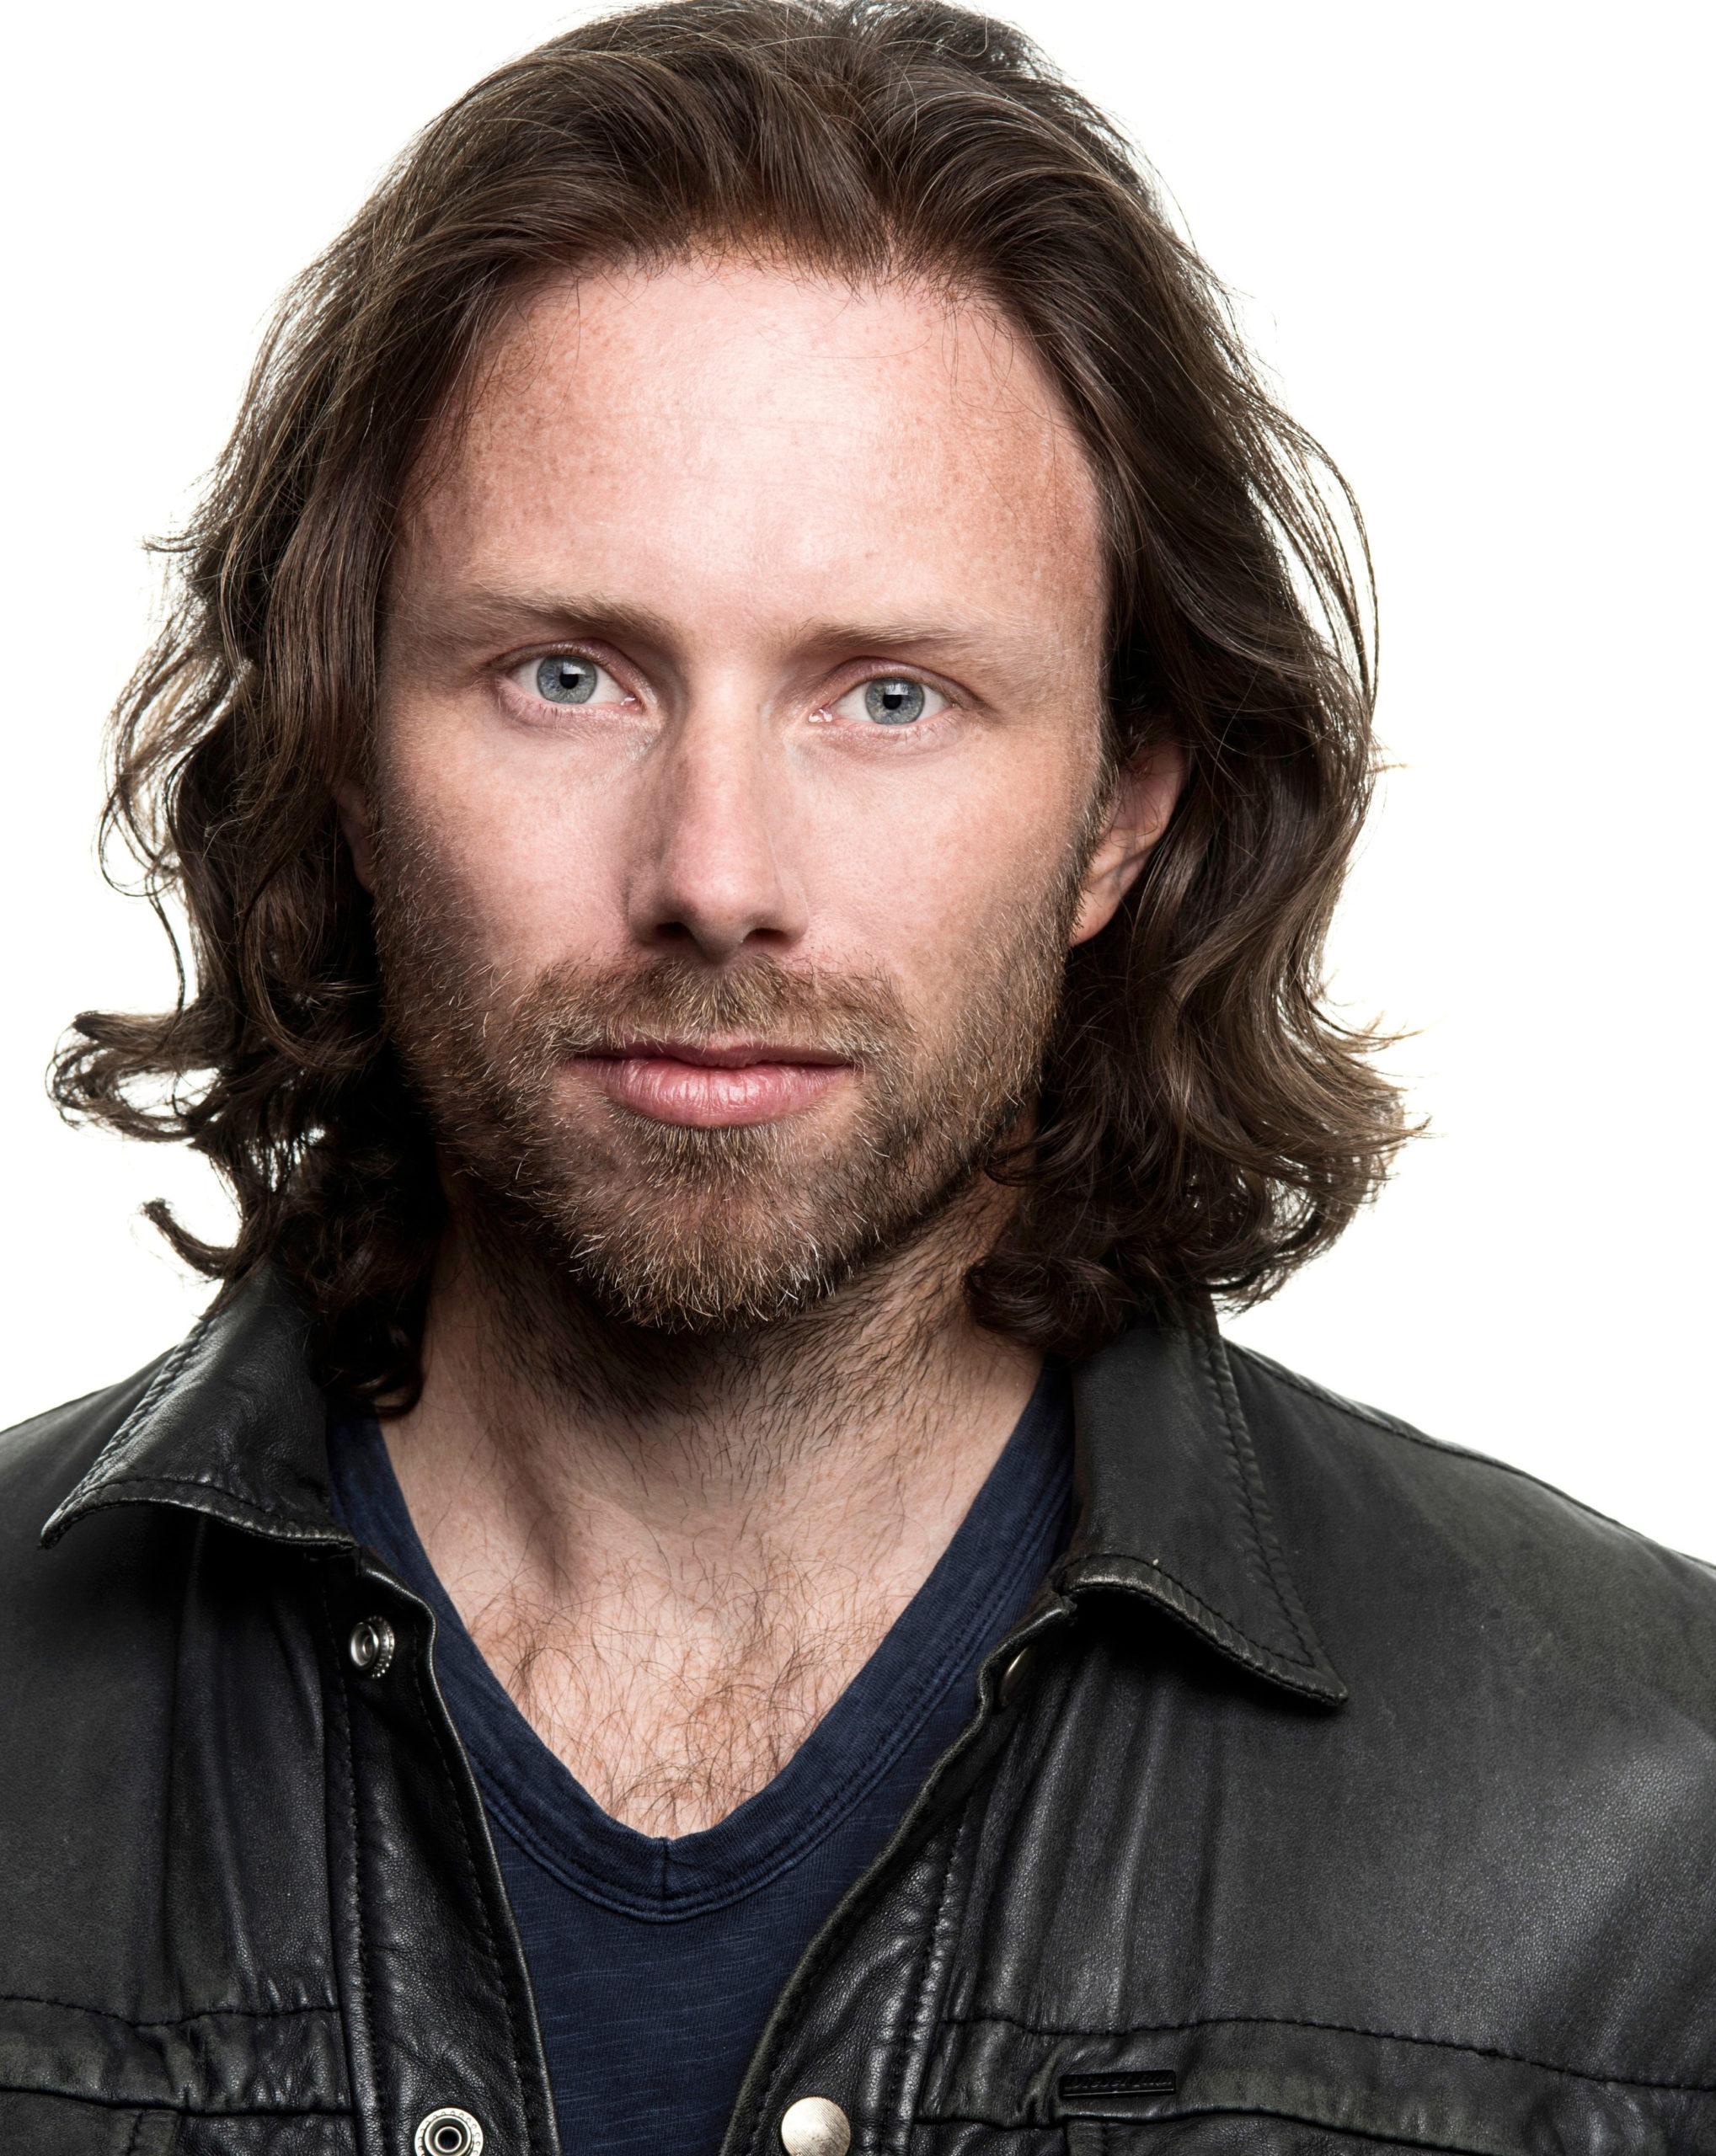 Chris Michael-Jarvis